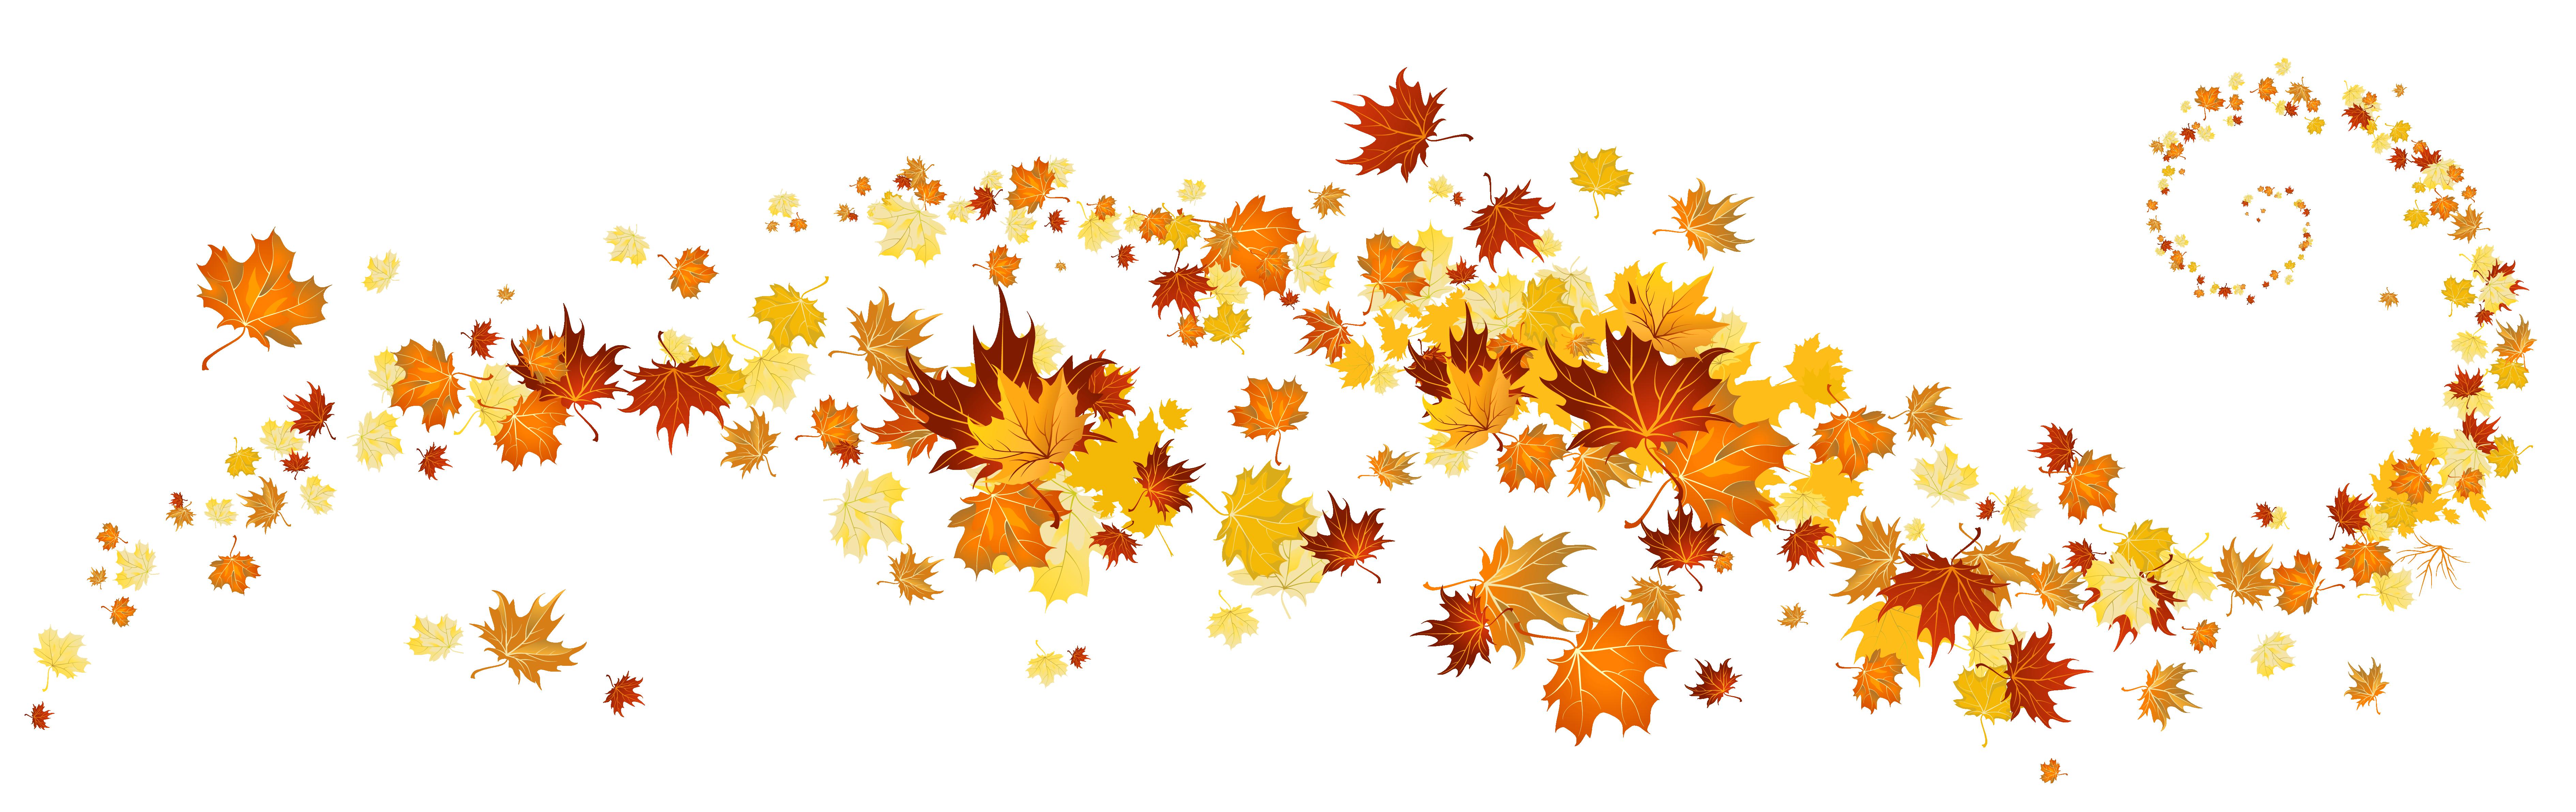 Leaves Fall Leaf Clip Art .-leaves fall leaf clip art .-16